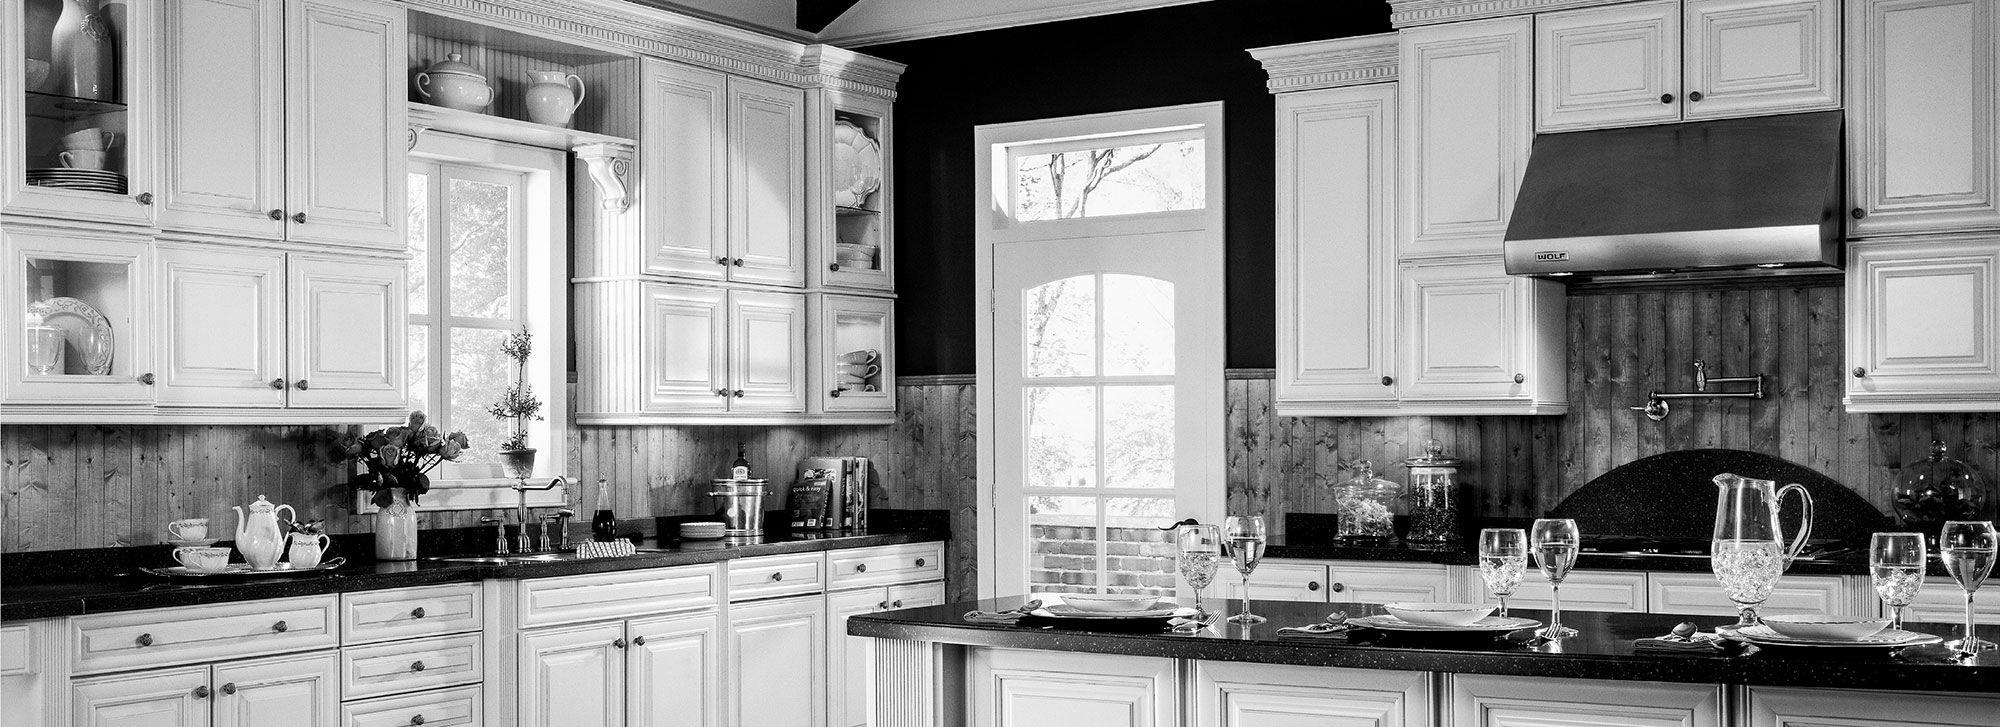 American Woodmark Shenandoah Kitchen Cabinets   http ...